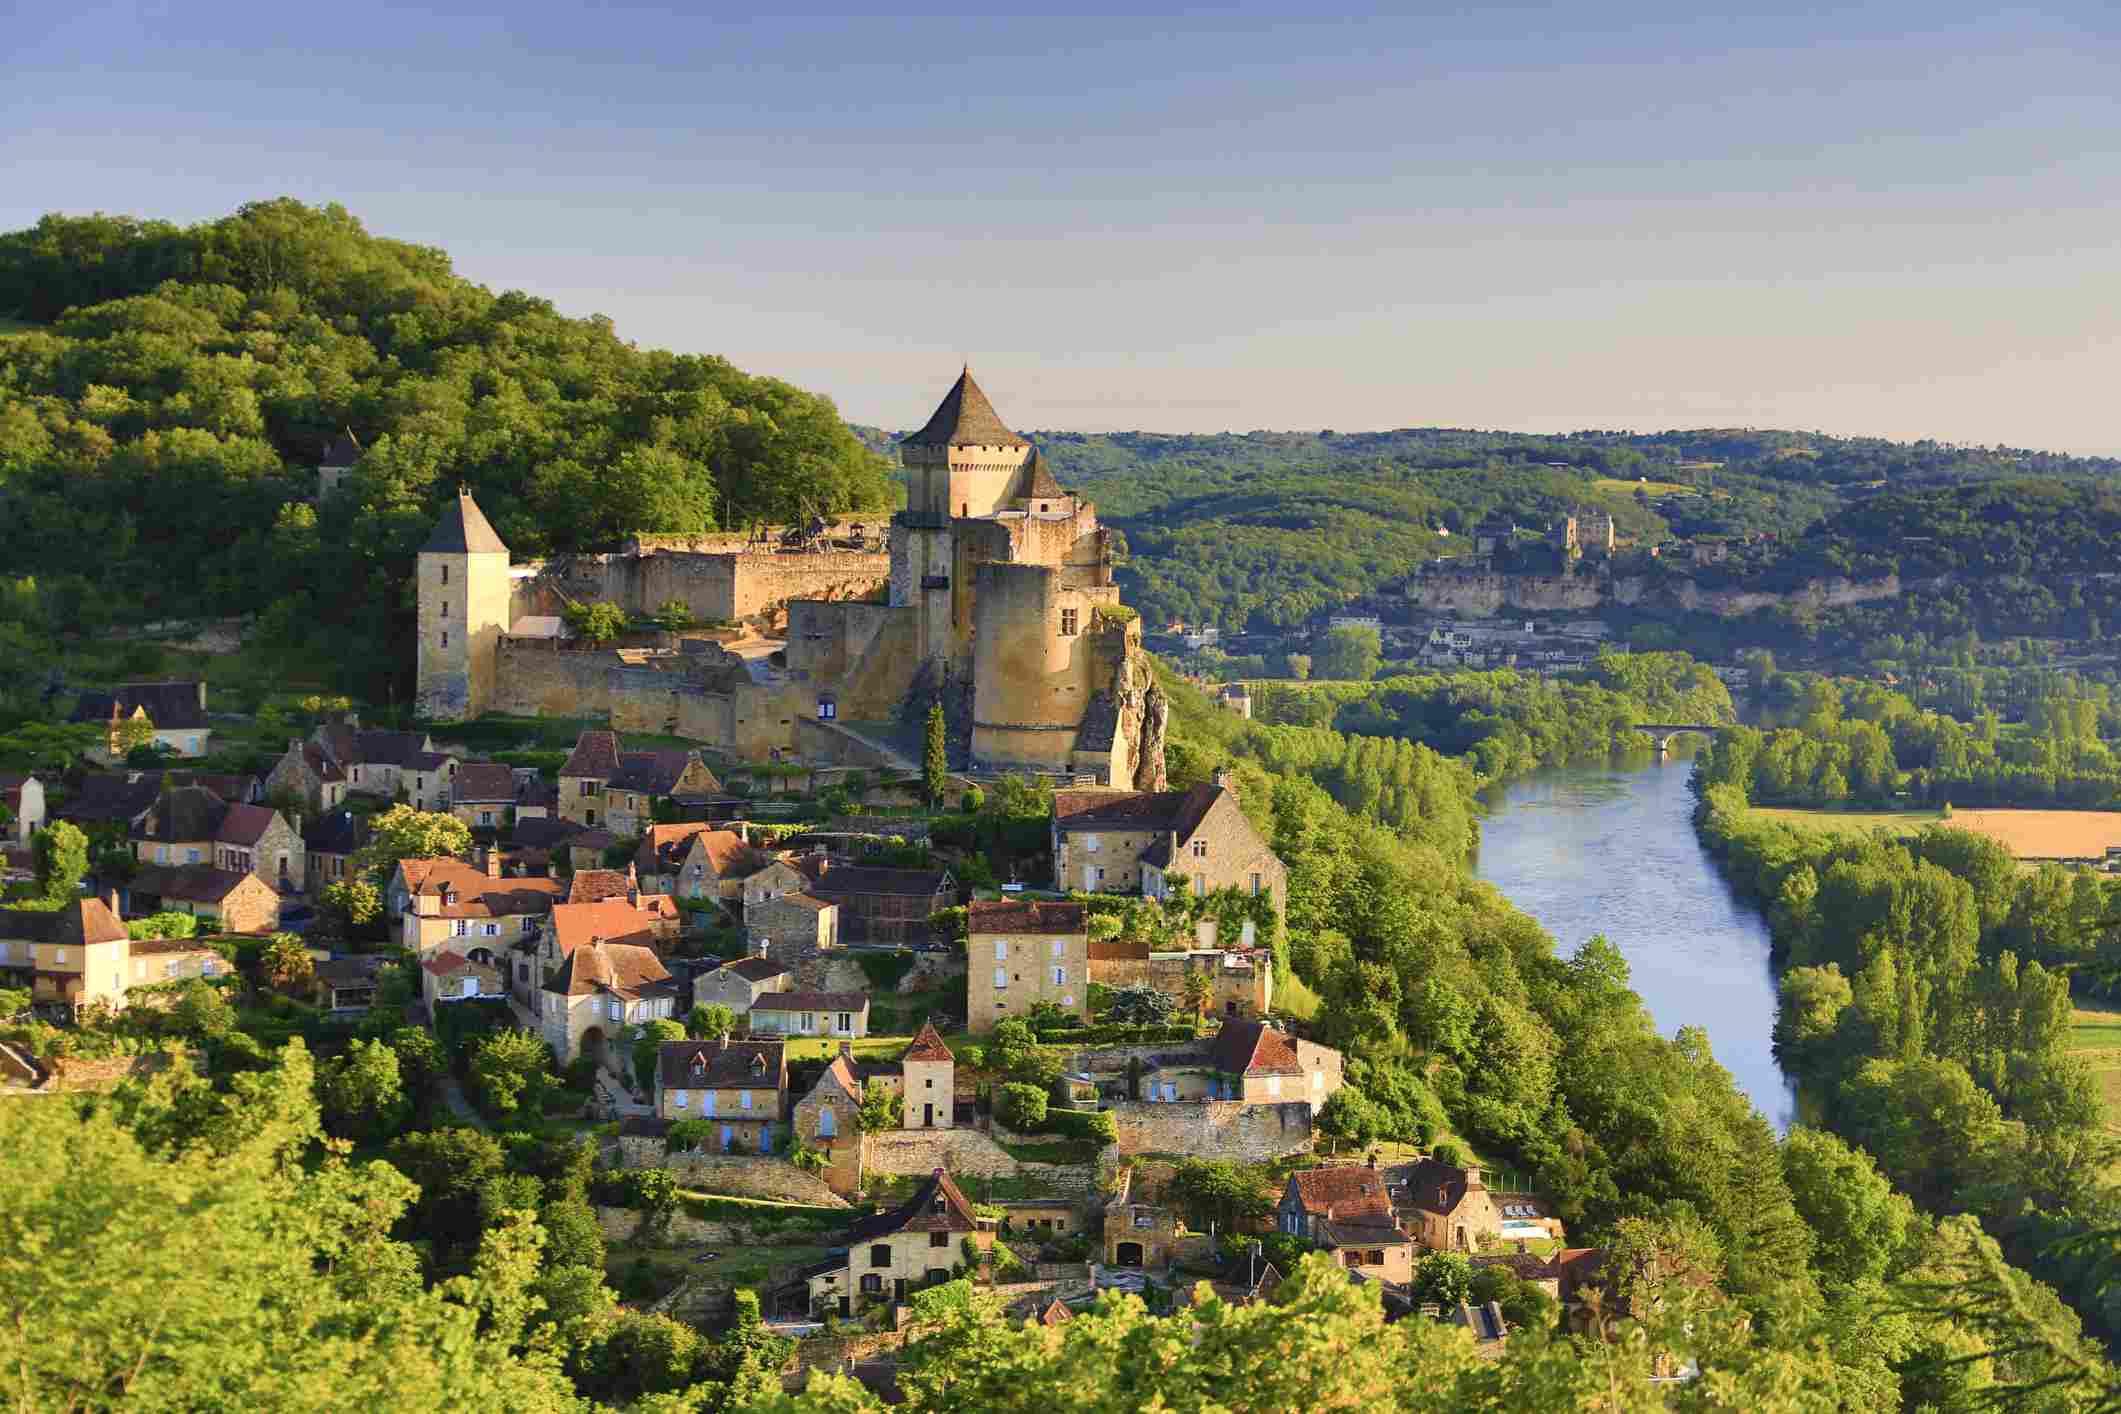 Beynac in the Dordogne Valley